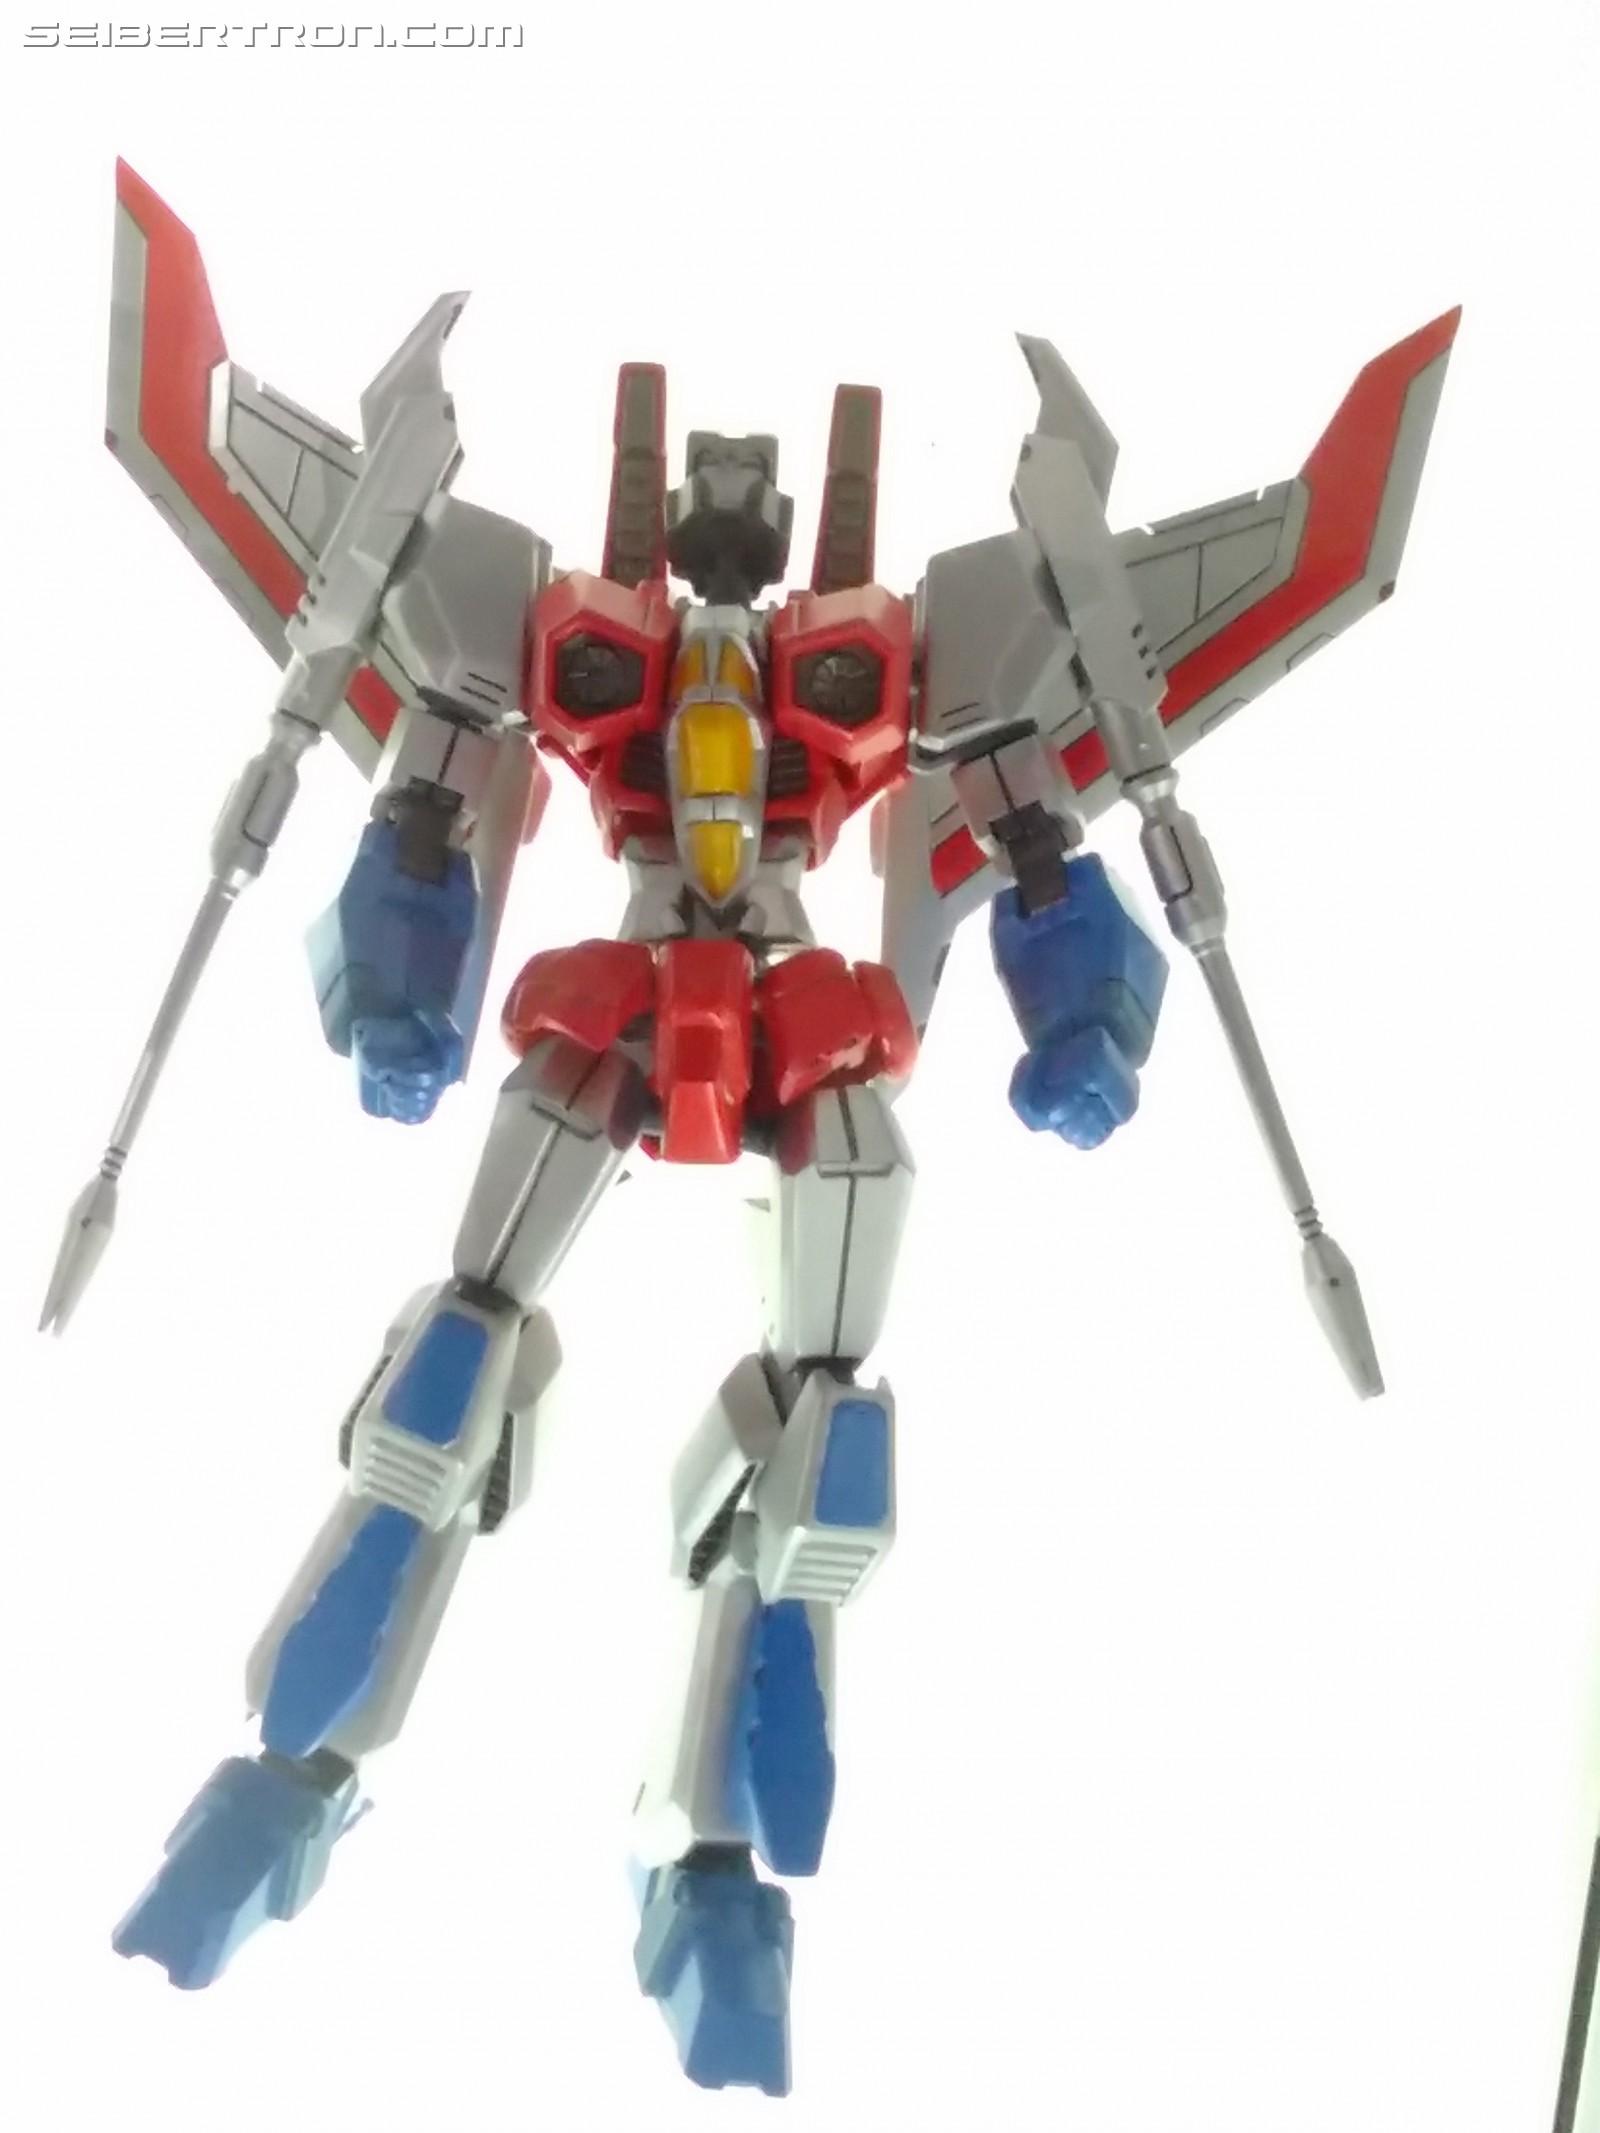 Transformers News: Flame Toys IDW Transformers at #SDCC2018: Tarn, Optimus Prime, Starscream & More